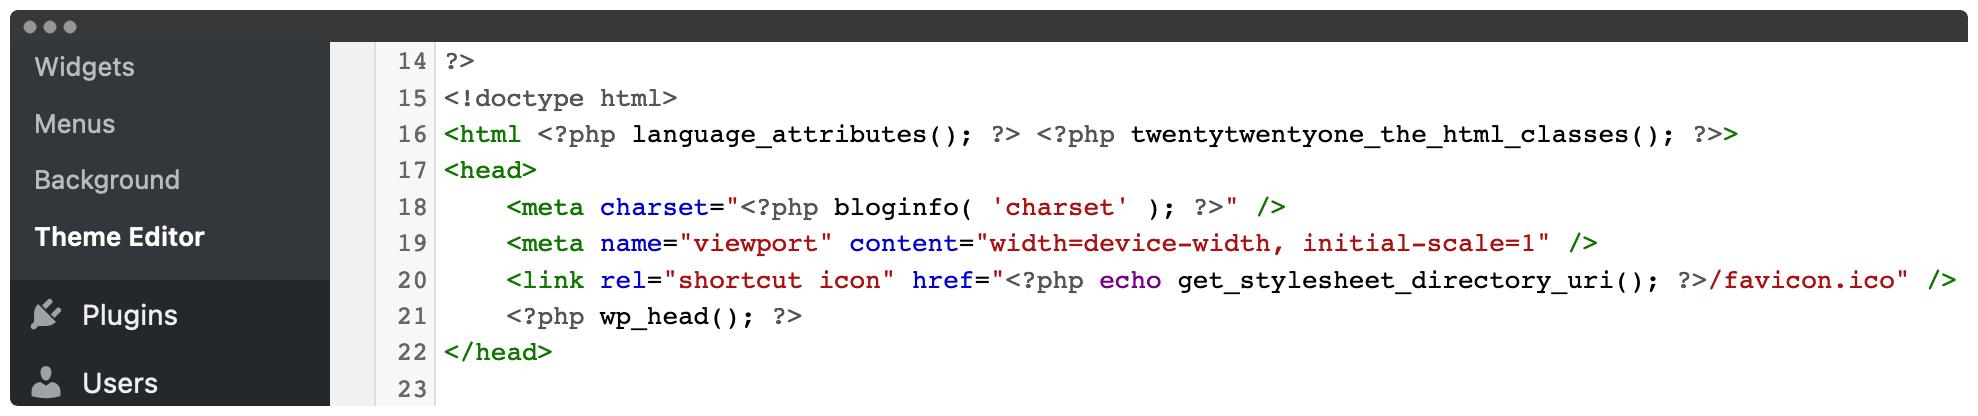 Adding code to the WordPress editor.